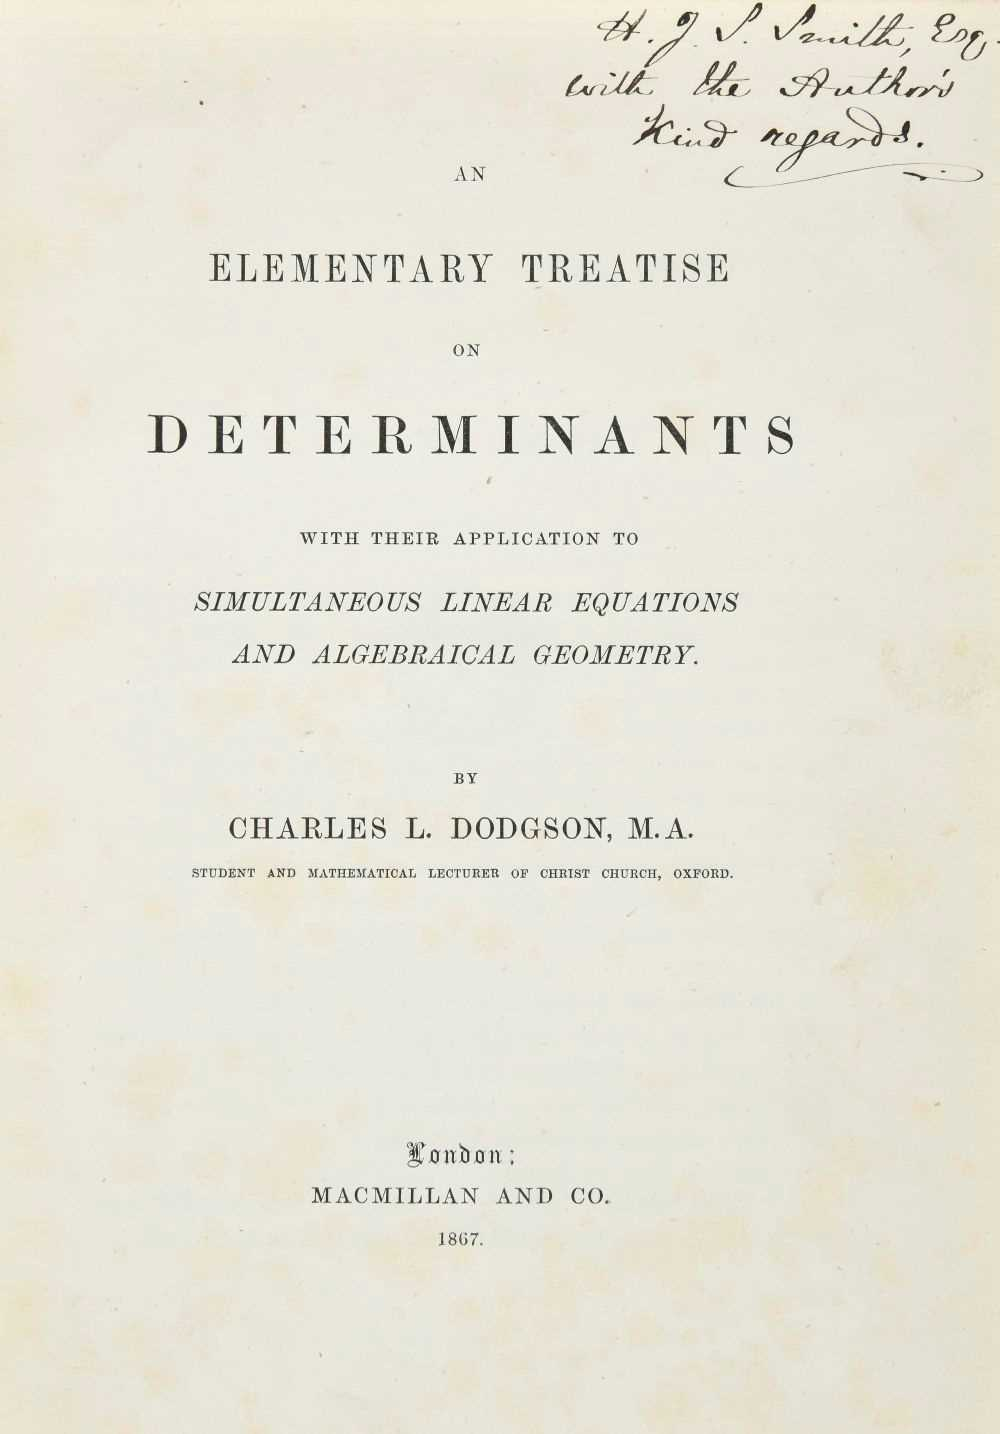 Lot 608 - Dodgson (Charles Lutwidge, 'Lewis Carroll'). An Elementary Treatise on Determinants, 1867